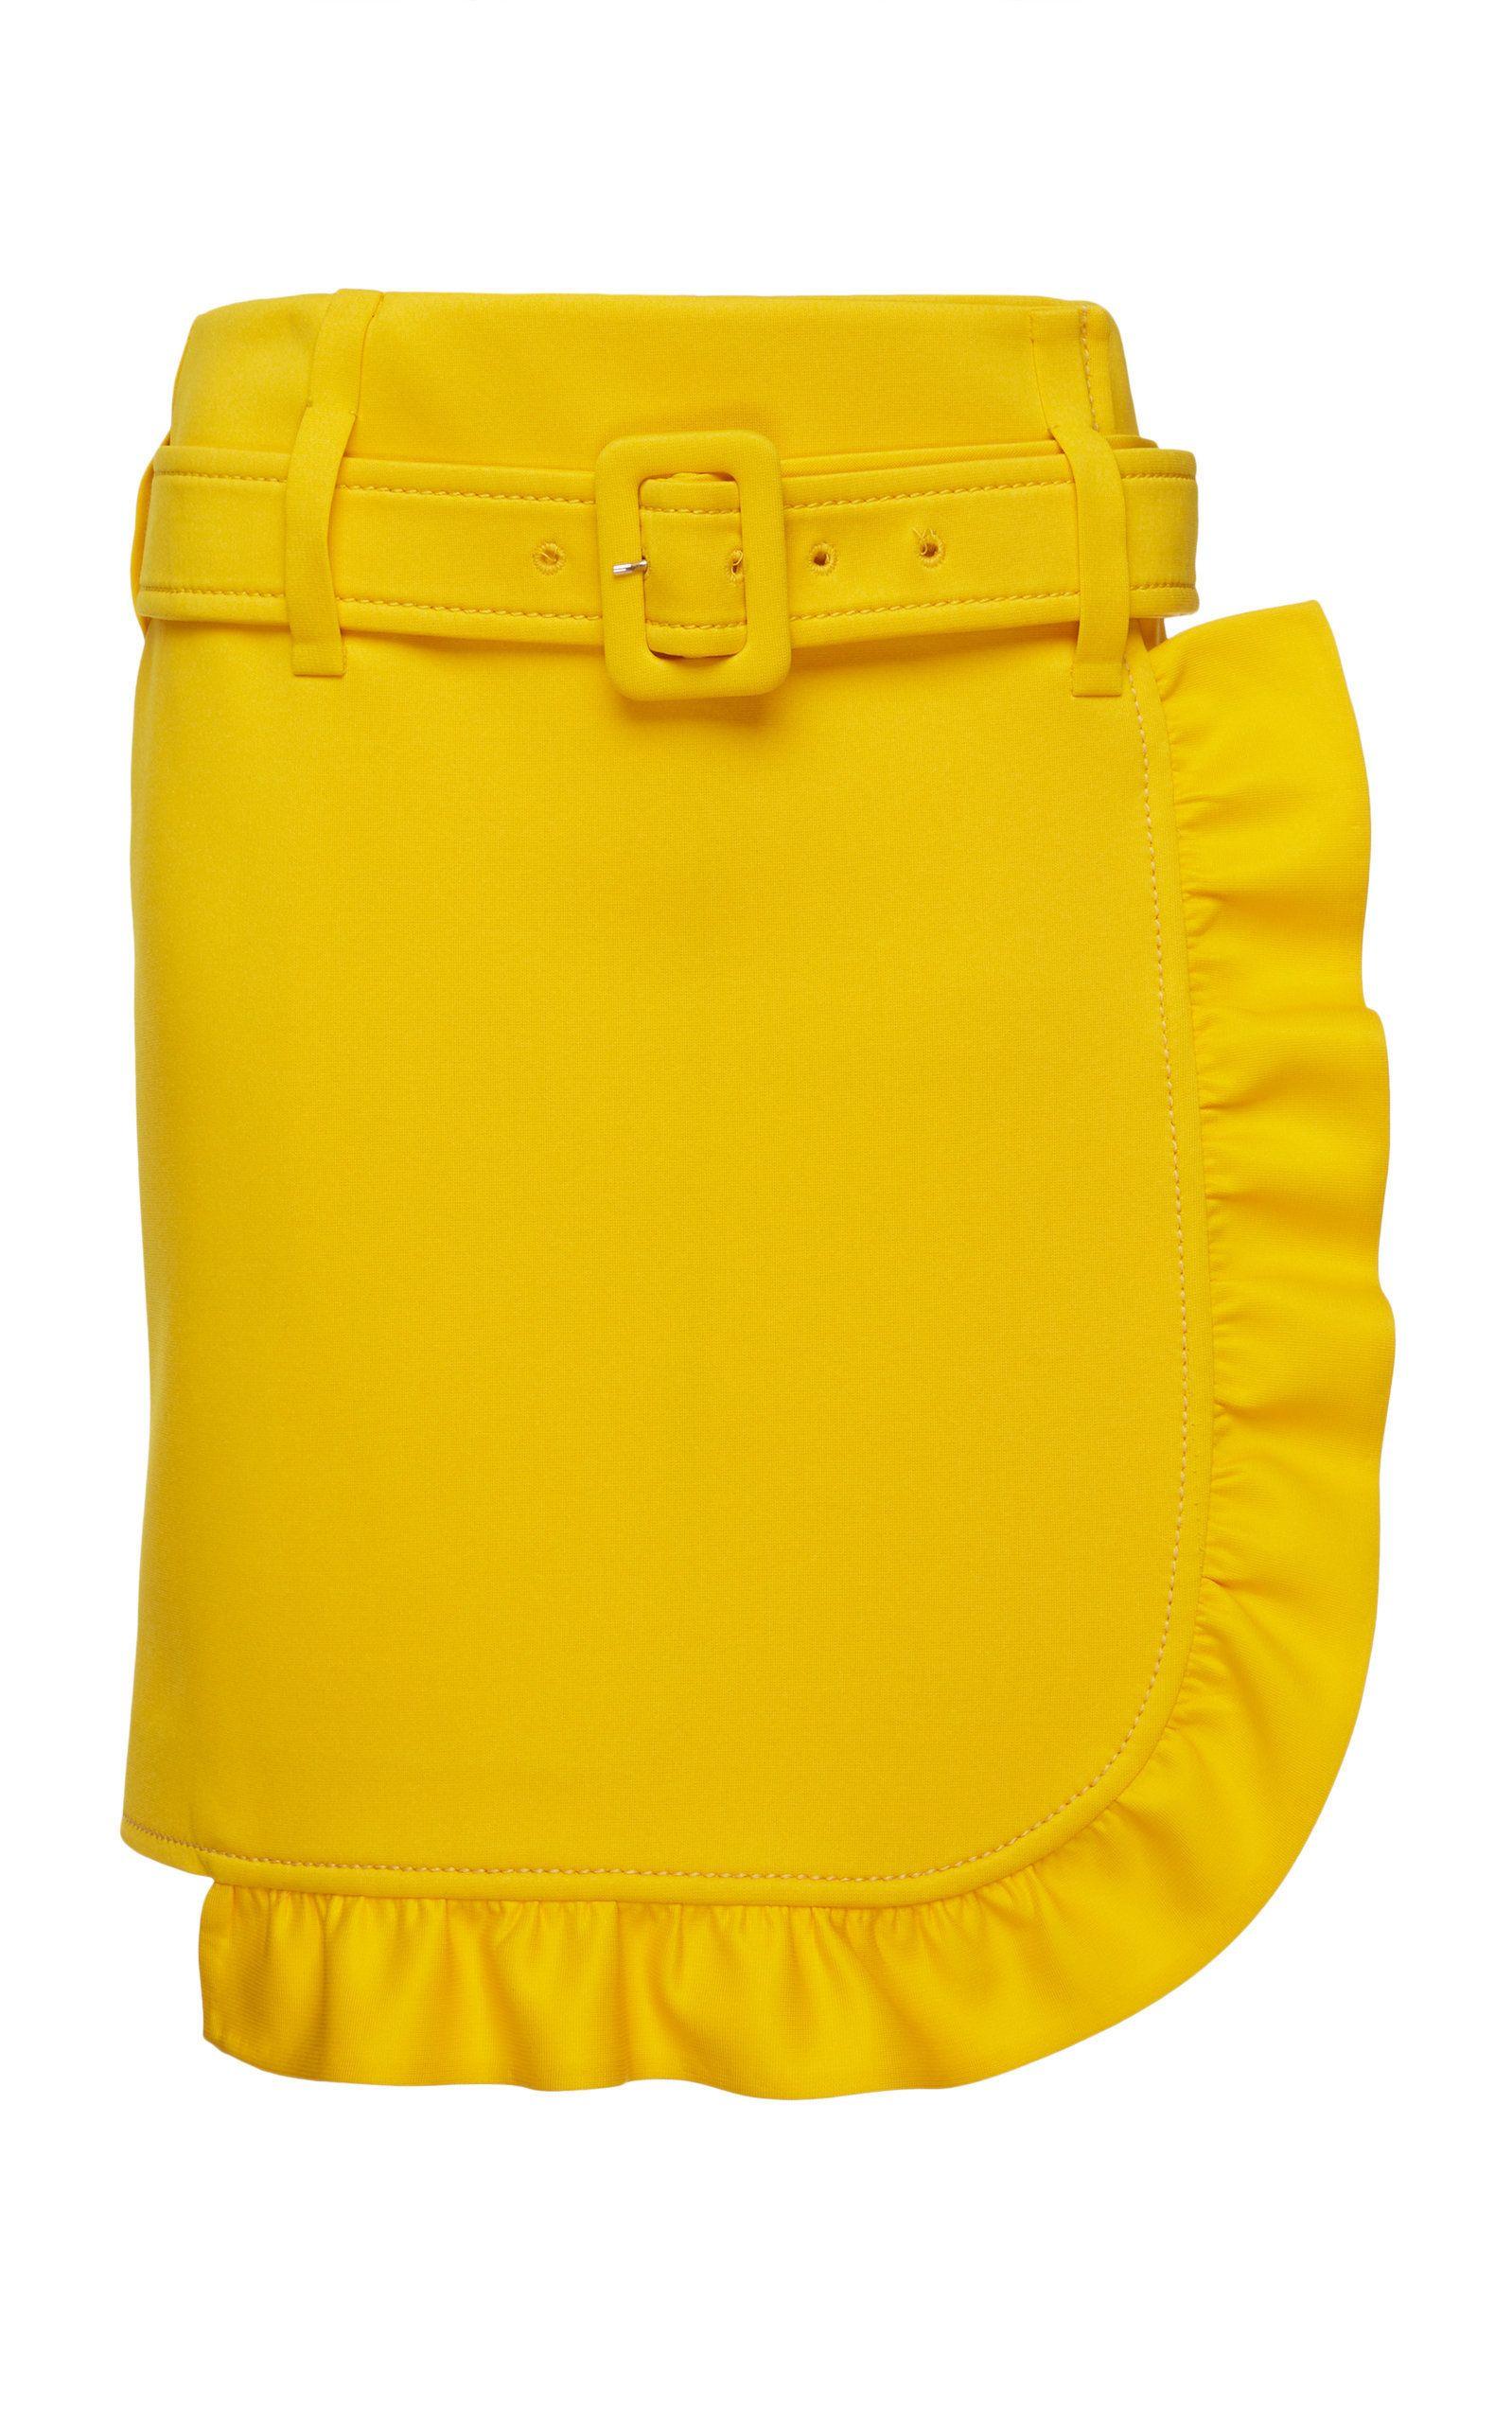 ce66b3d832c24 Prada Ruffled Crepe Mini Skirt in 2019 | Products | Skirts, Mini ...